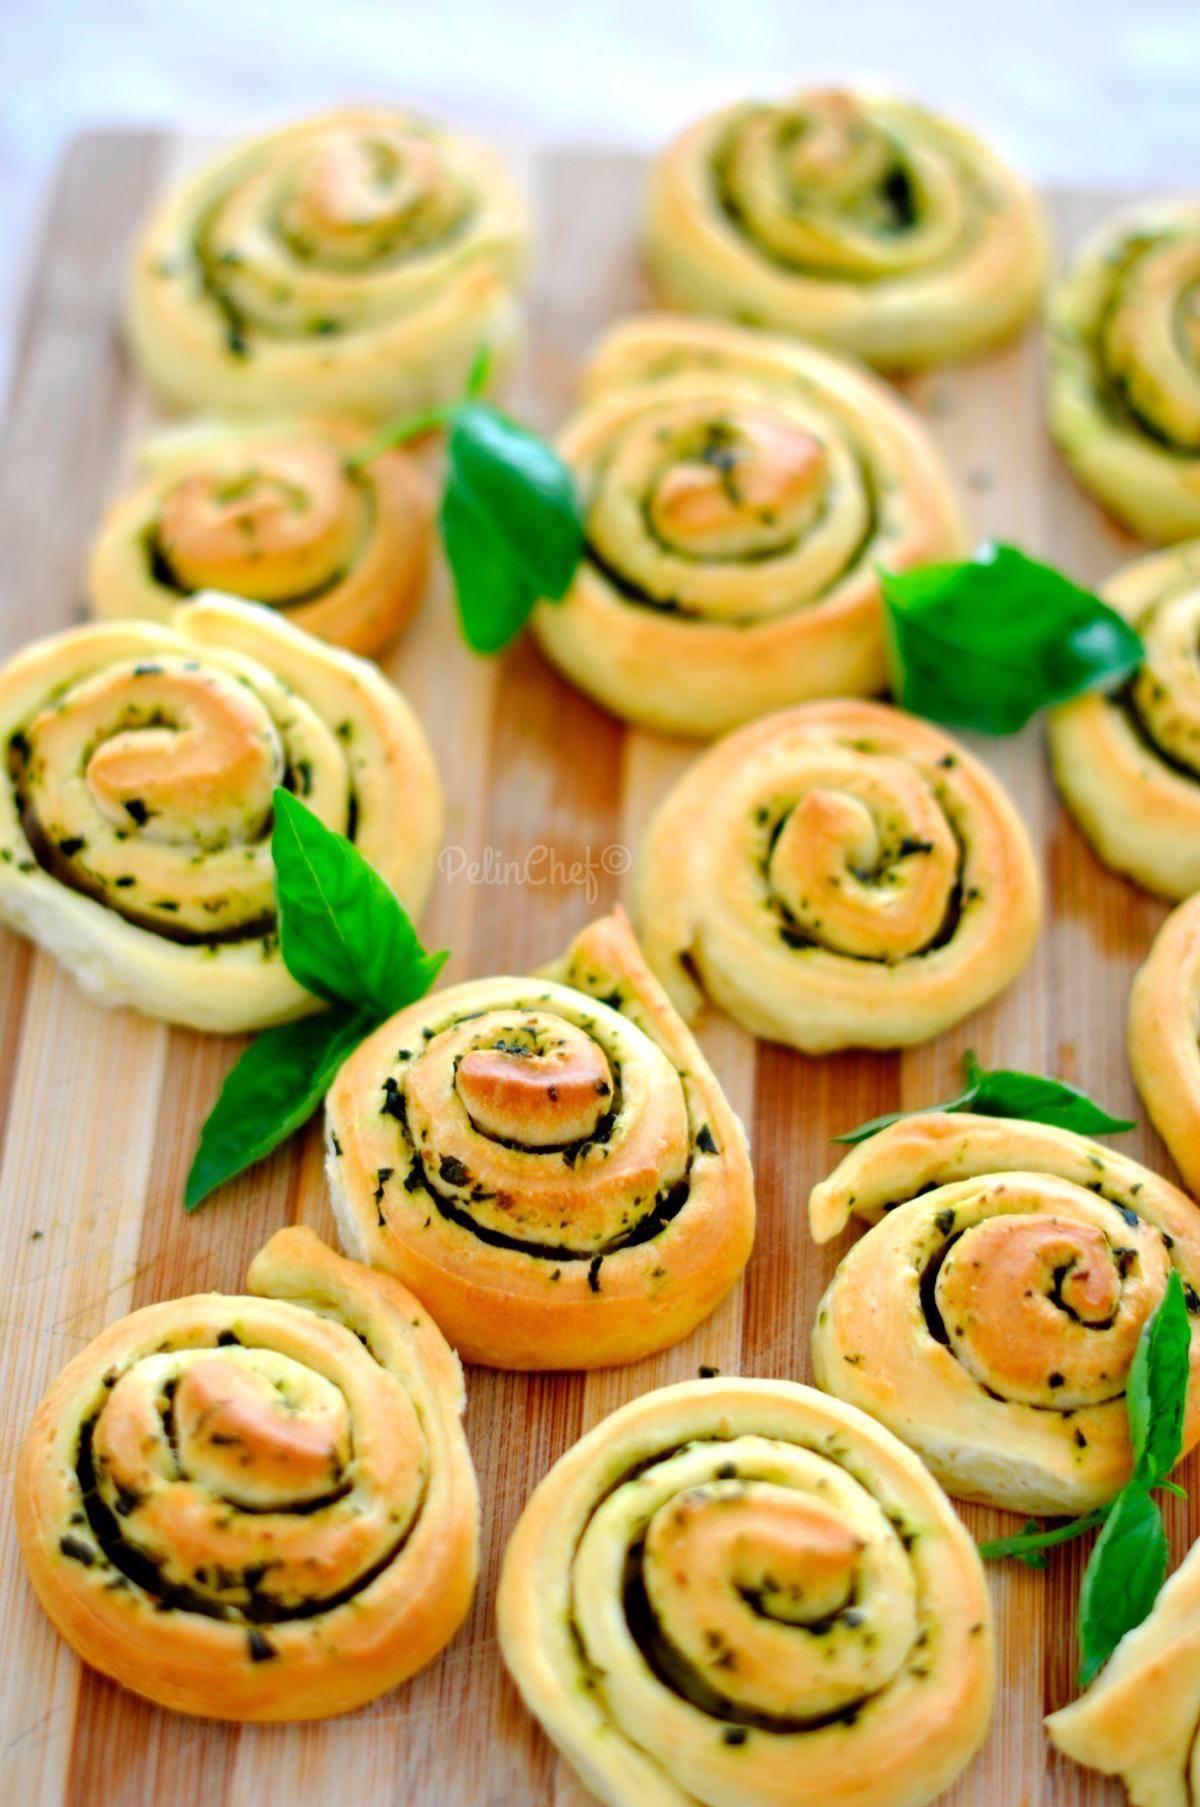 pestolu-peynirli-poğaça1